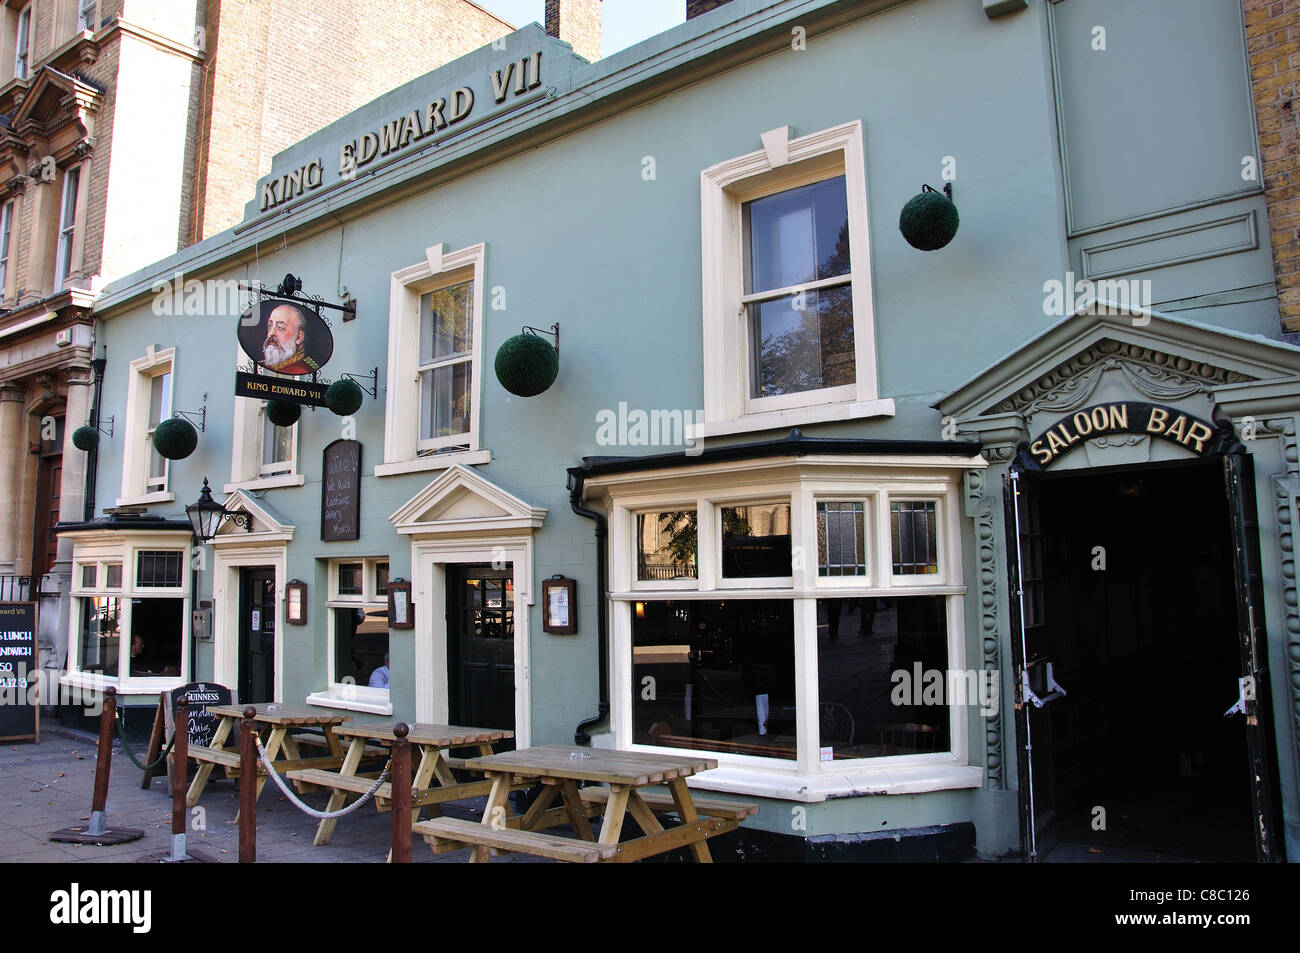 19th century king edward viii pub high street stratford. Black Bedroom Furniture Sets. Home Design Ideas